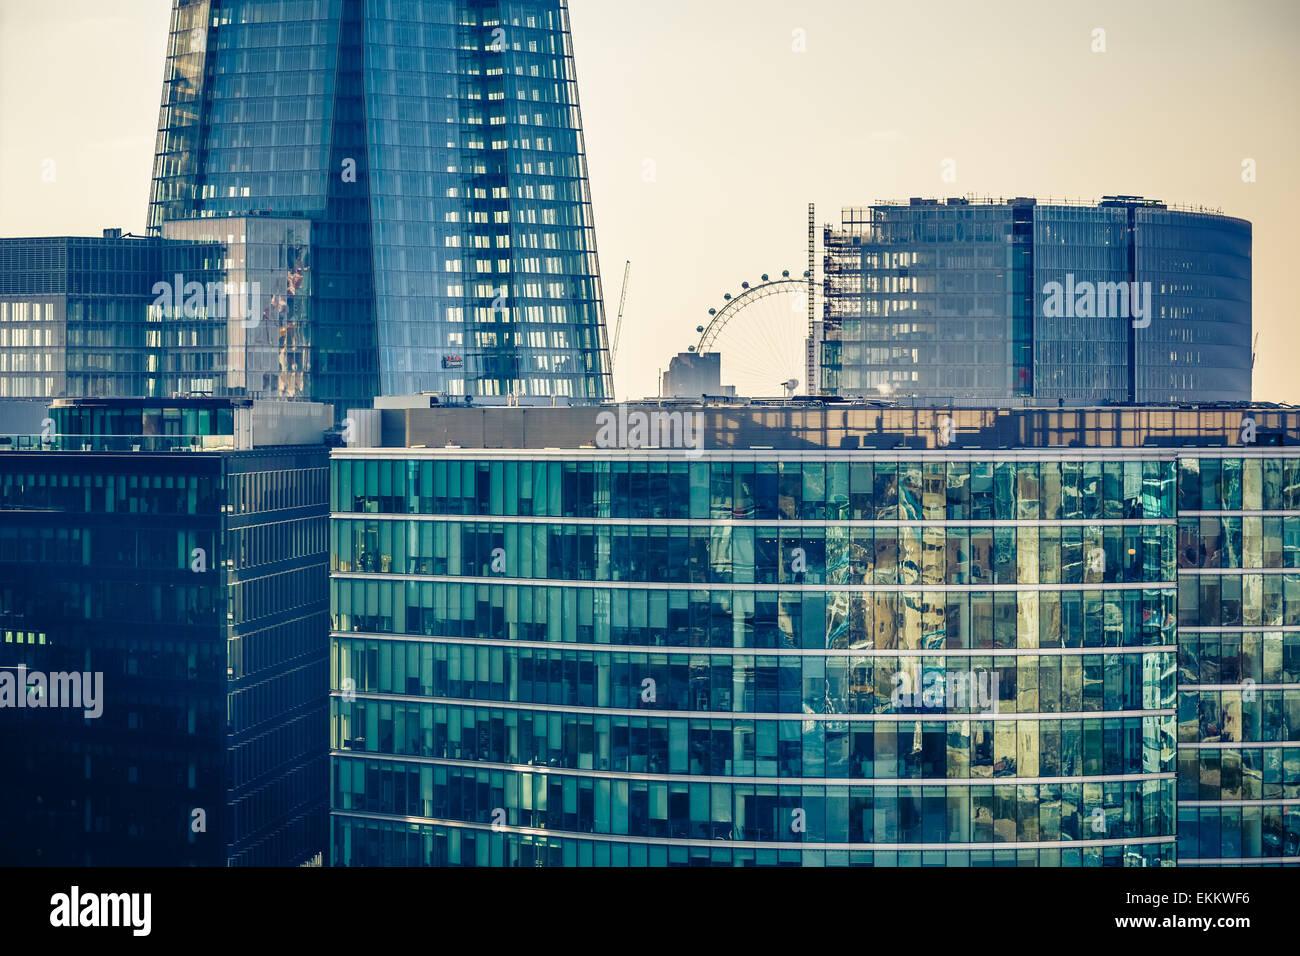 Gebäude der Stadt London Stockbild